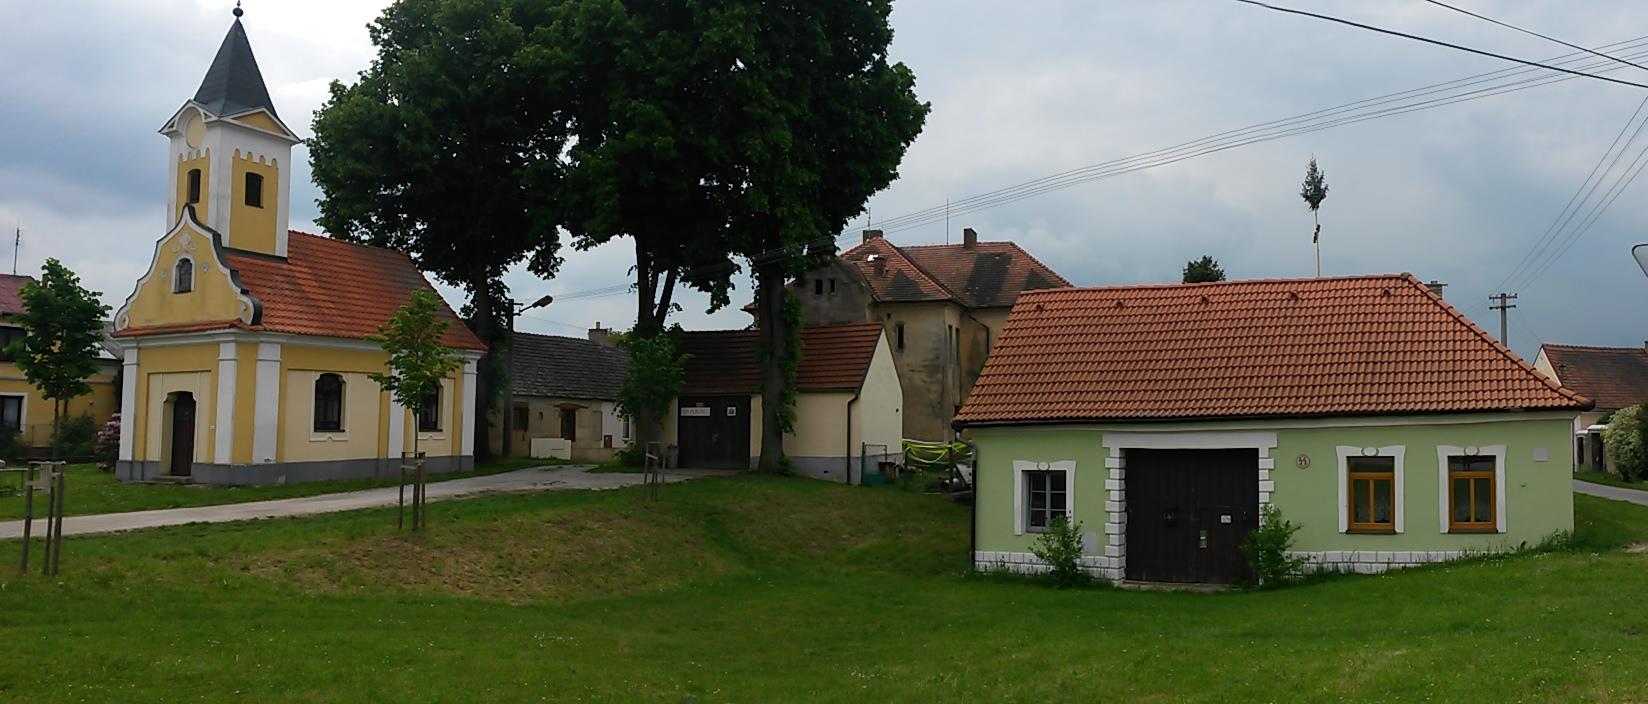 Südböhmisches Dorf Horusice im Landkreis Tábor